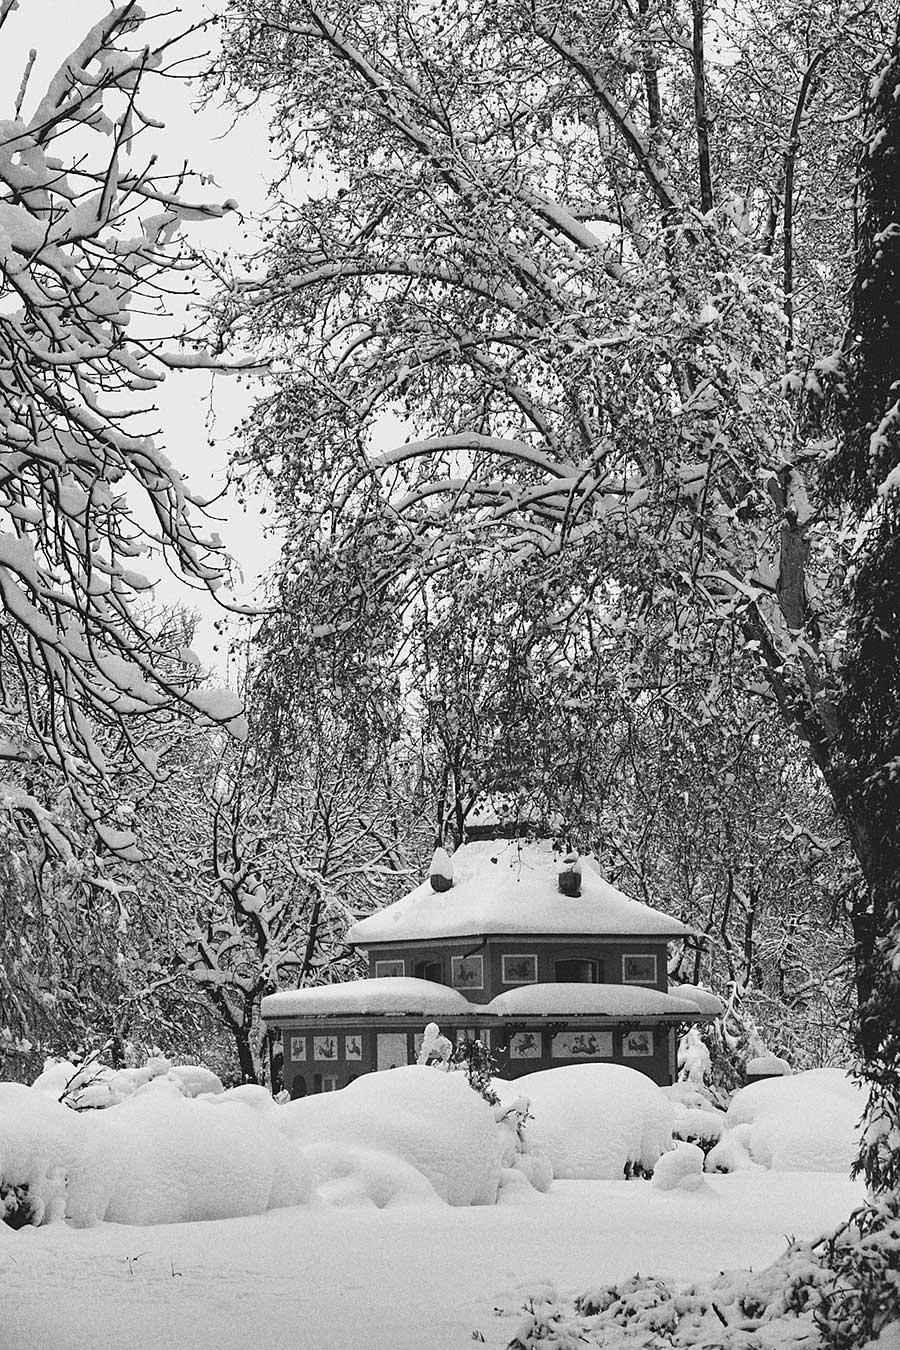 Parque del Buen Retiro con nieve